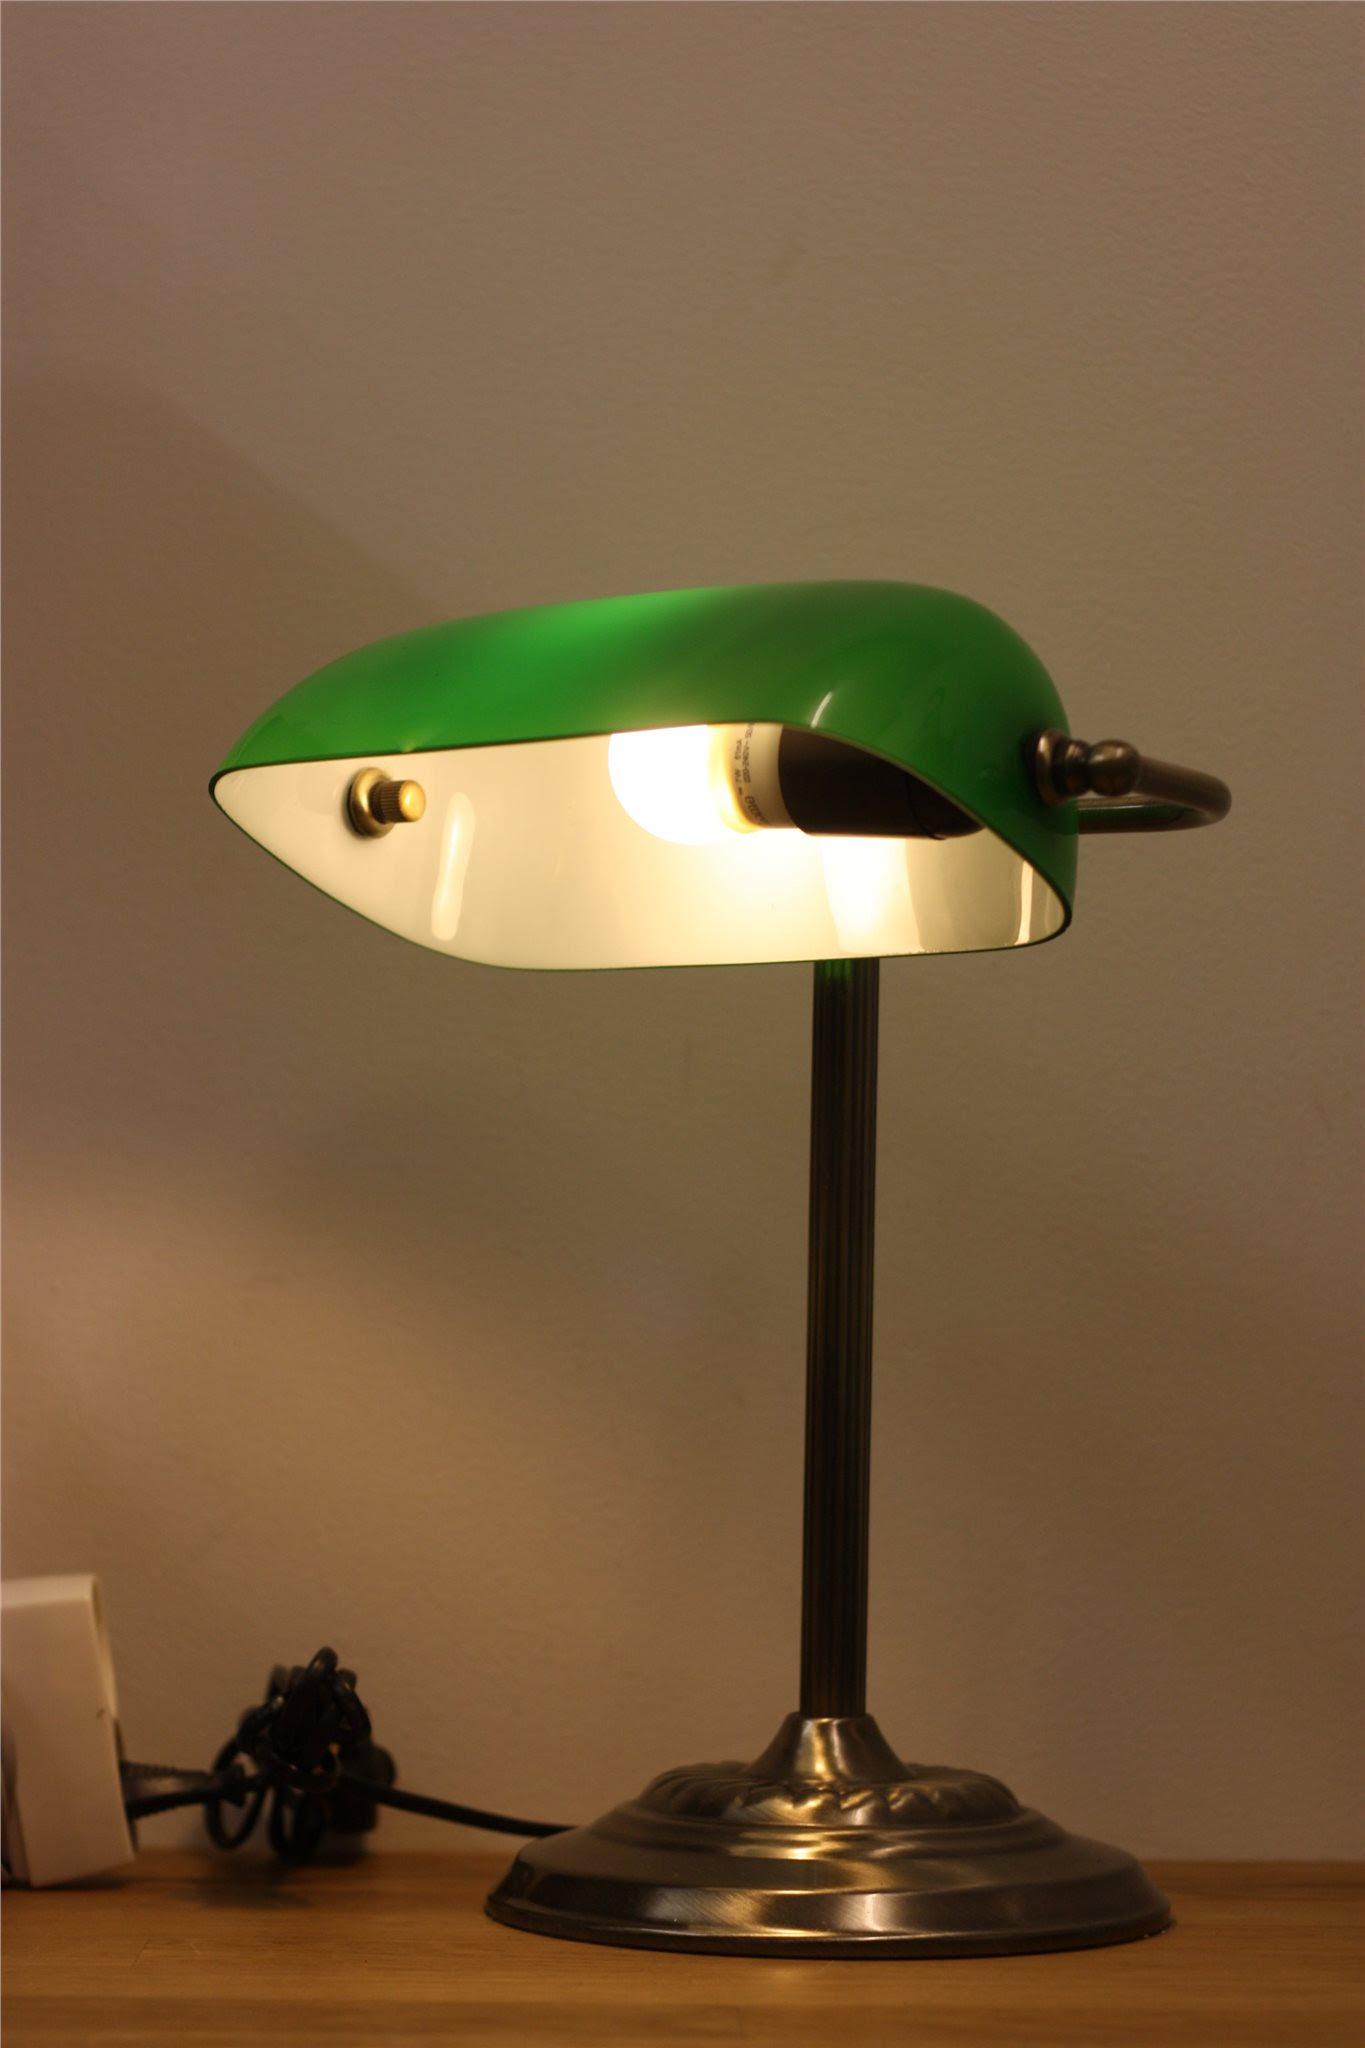 Strålande Belysning Skrivbord. Jk Belysning. Skrivbord S Lampa Frn Ikea HP-08